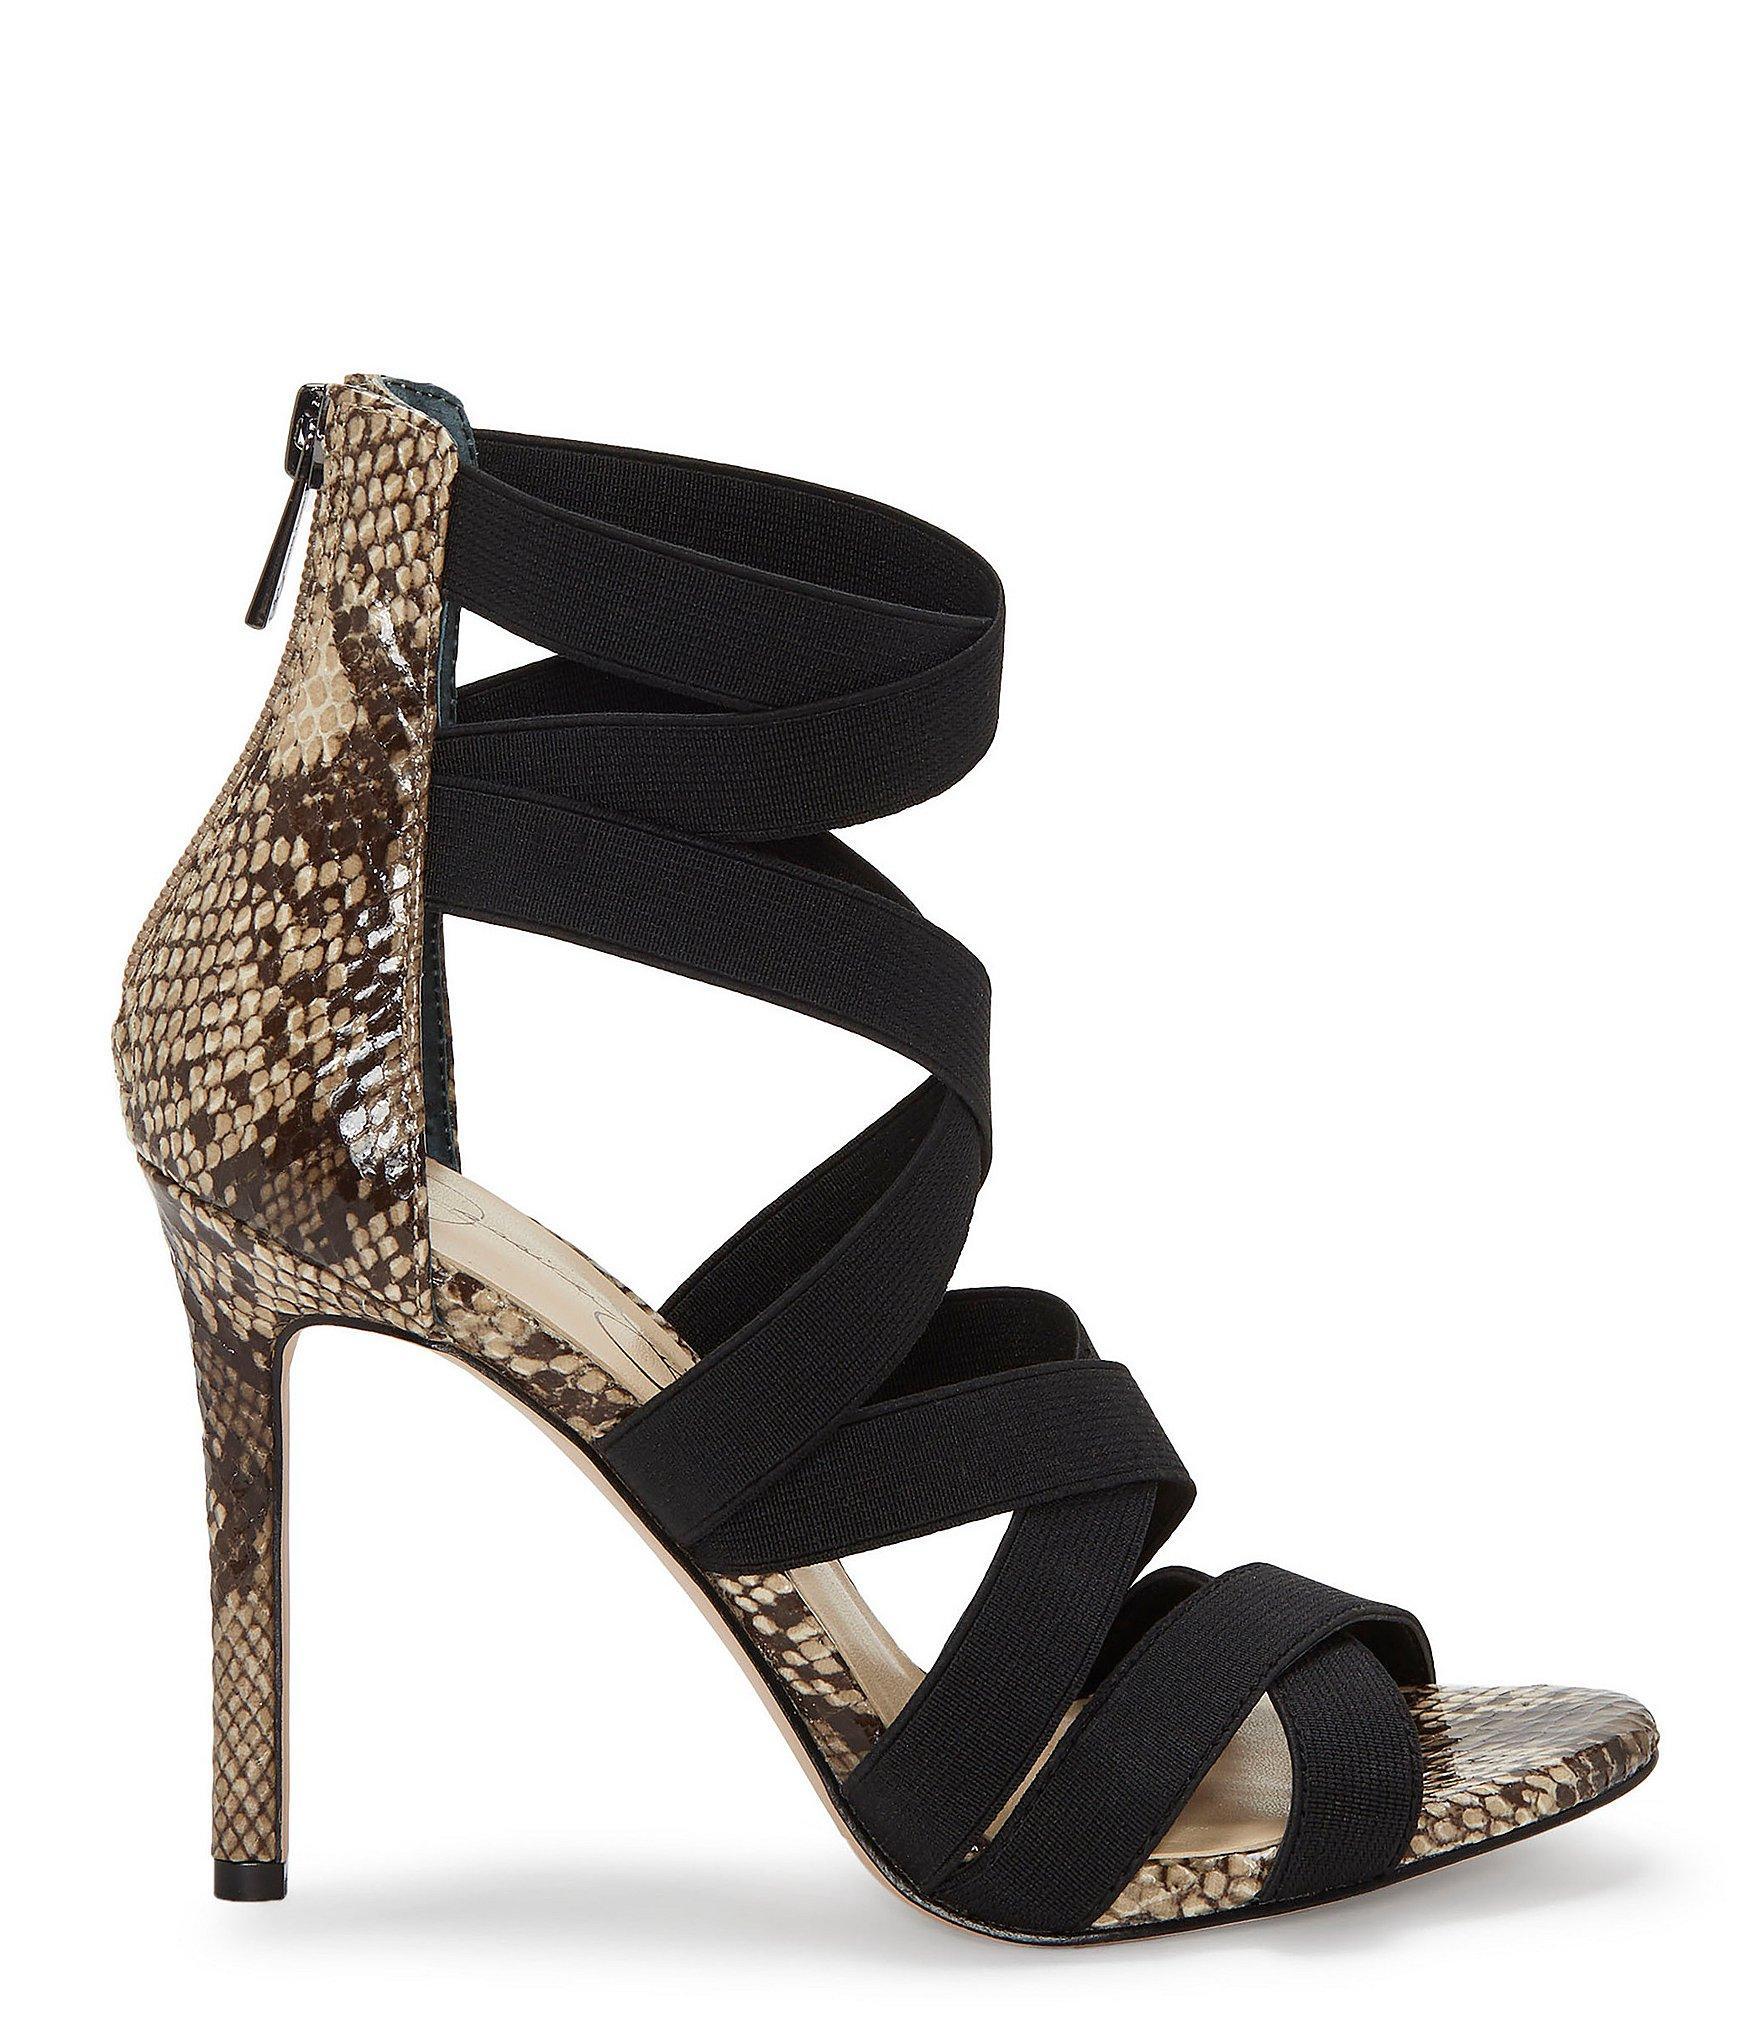 Jyra Strappy Dress Sandals